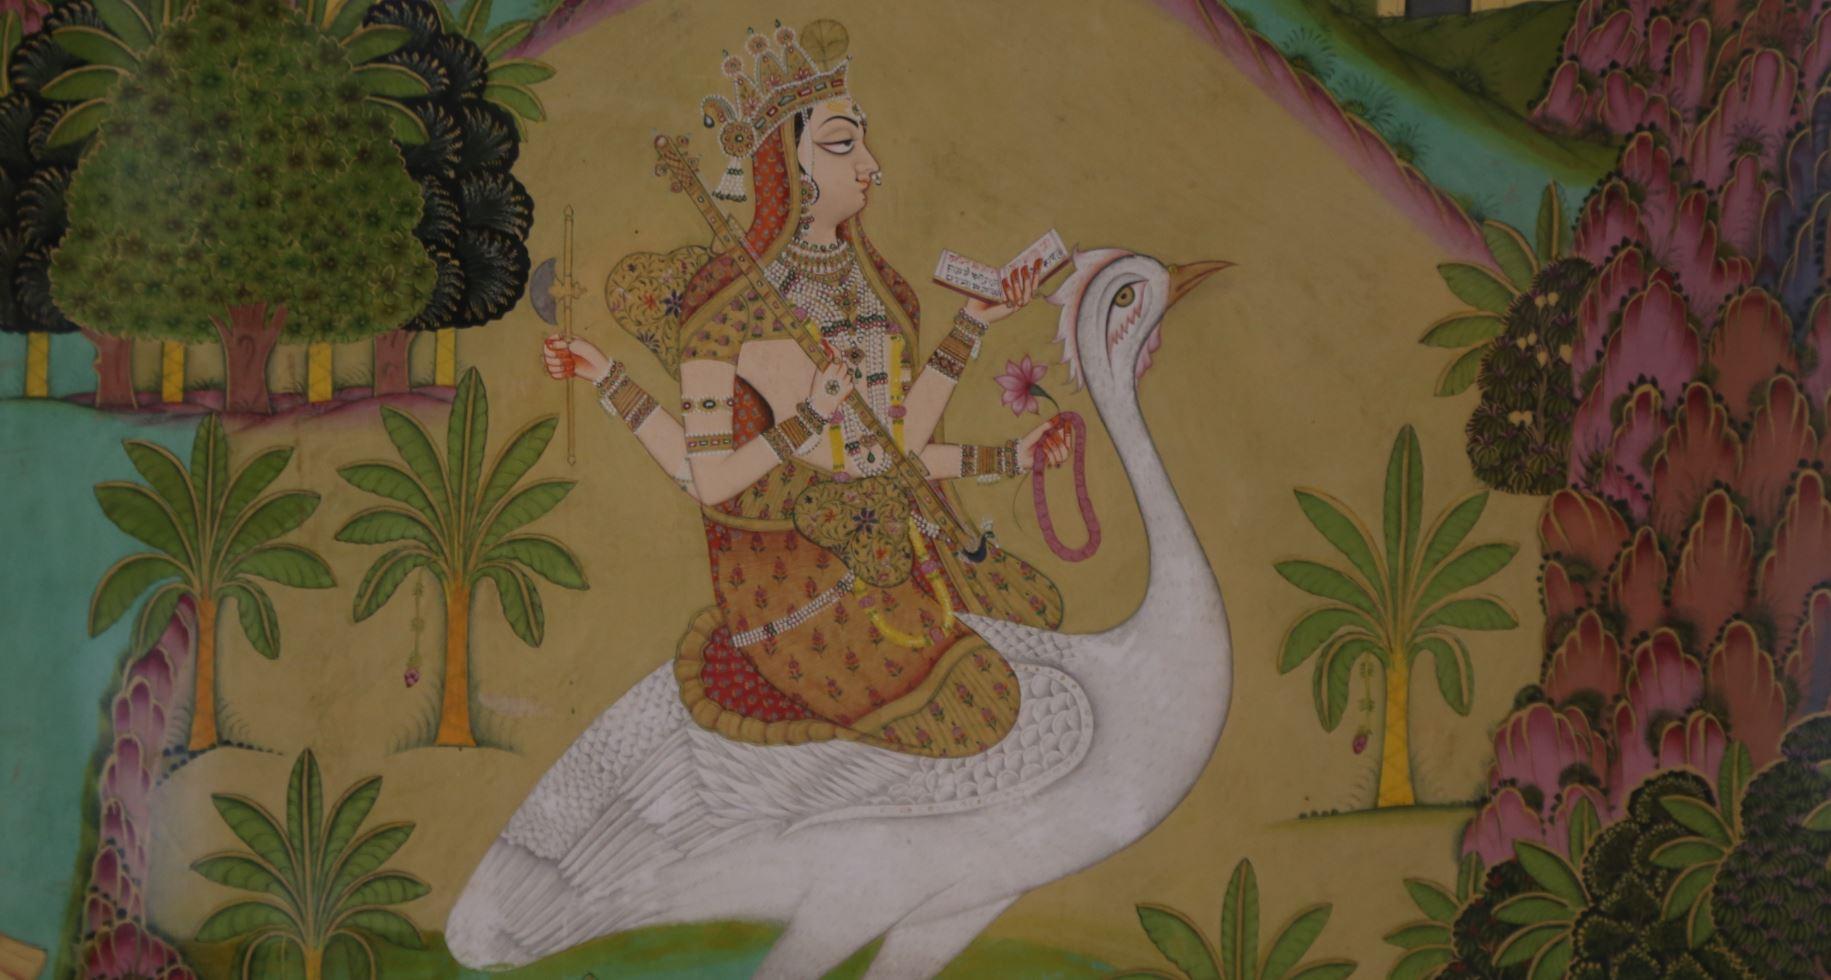 saraswati cygne ART MUSIQUE SAVOIR symbol